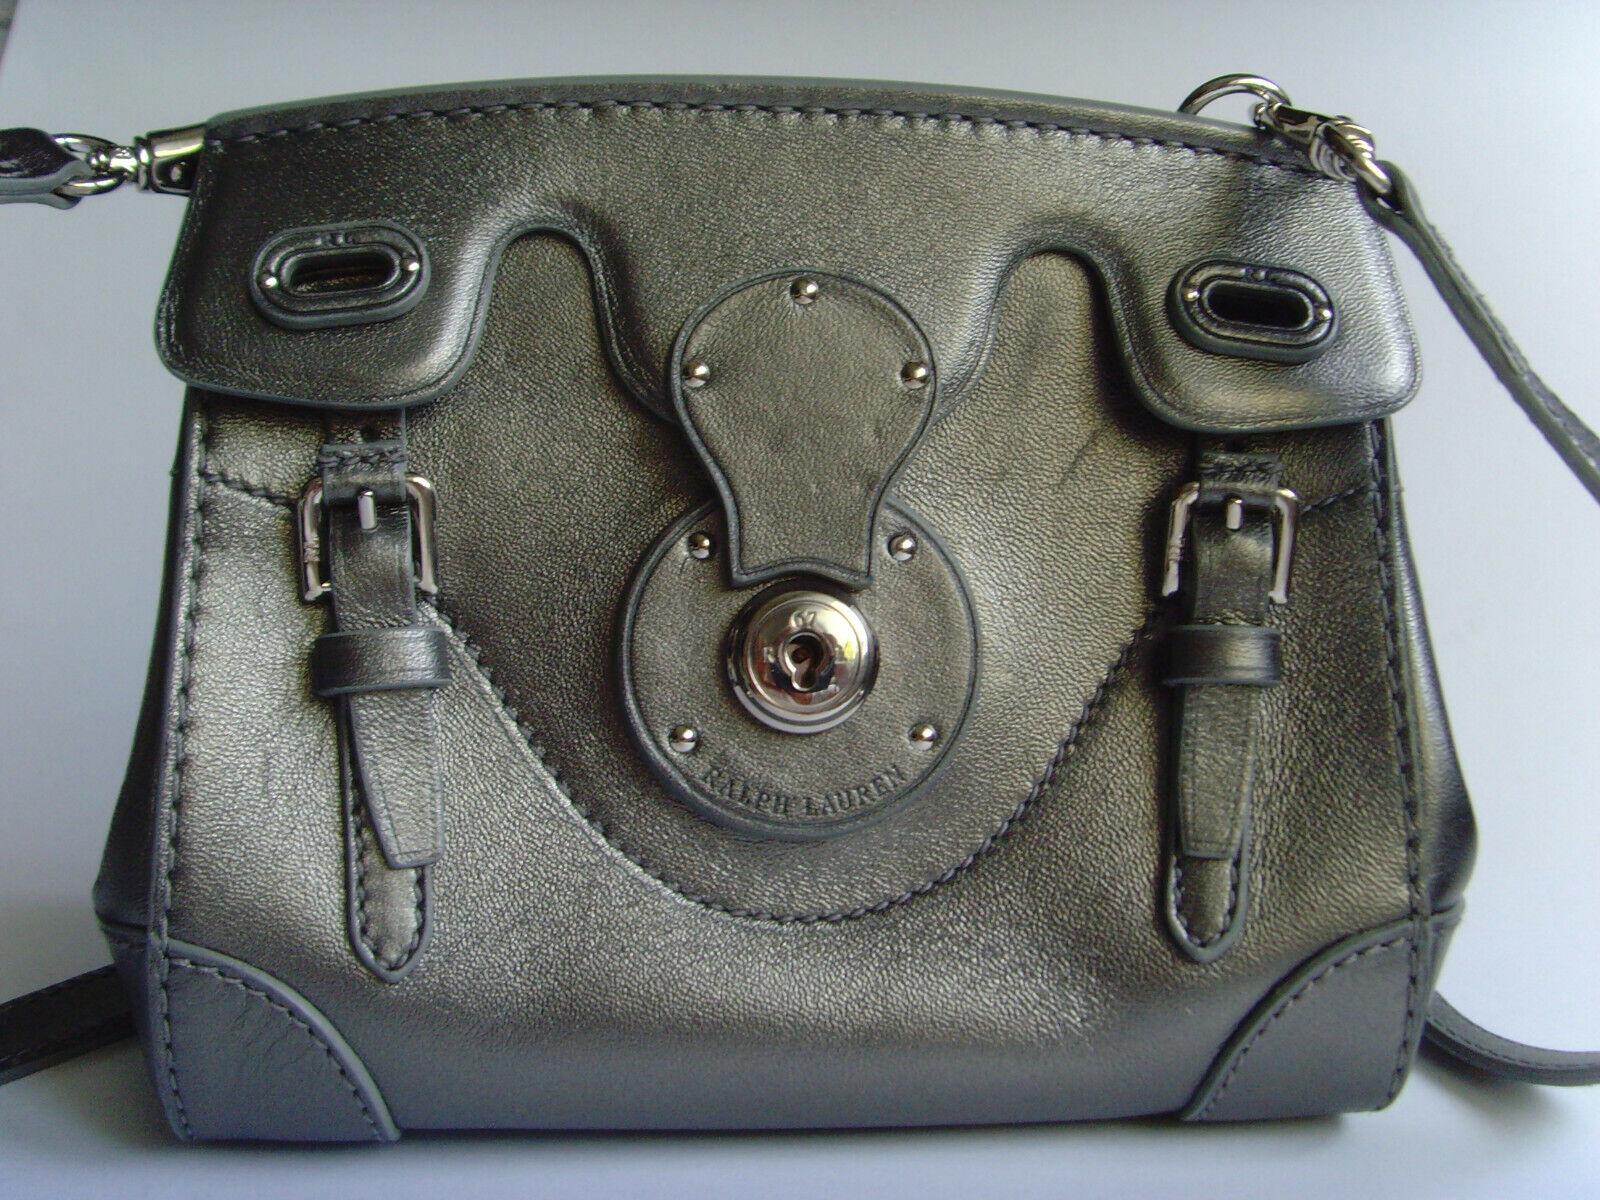 Schöne Mini Handtasche - Luxus Marke - Original RALPH LAUREN